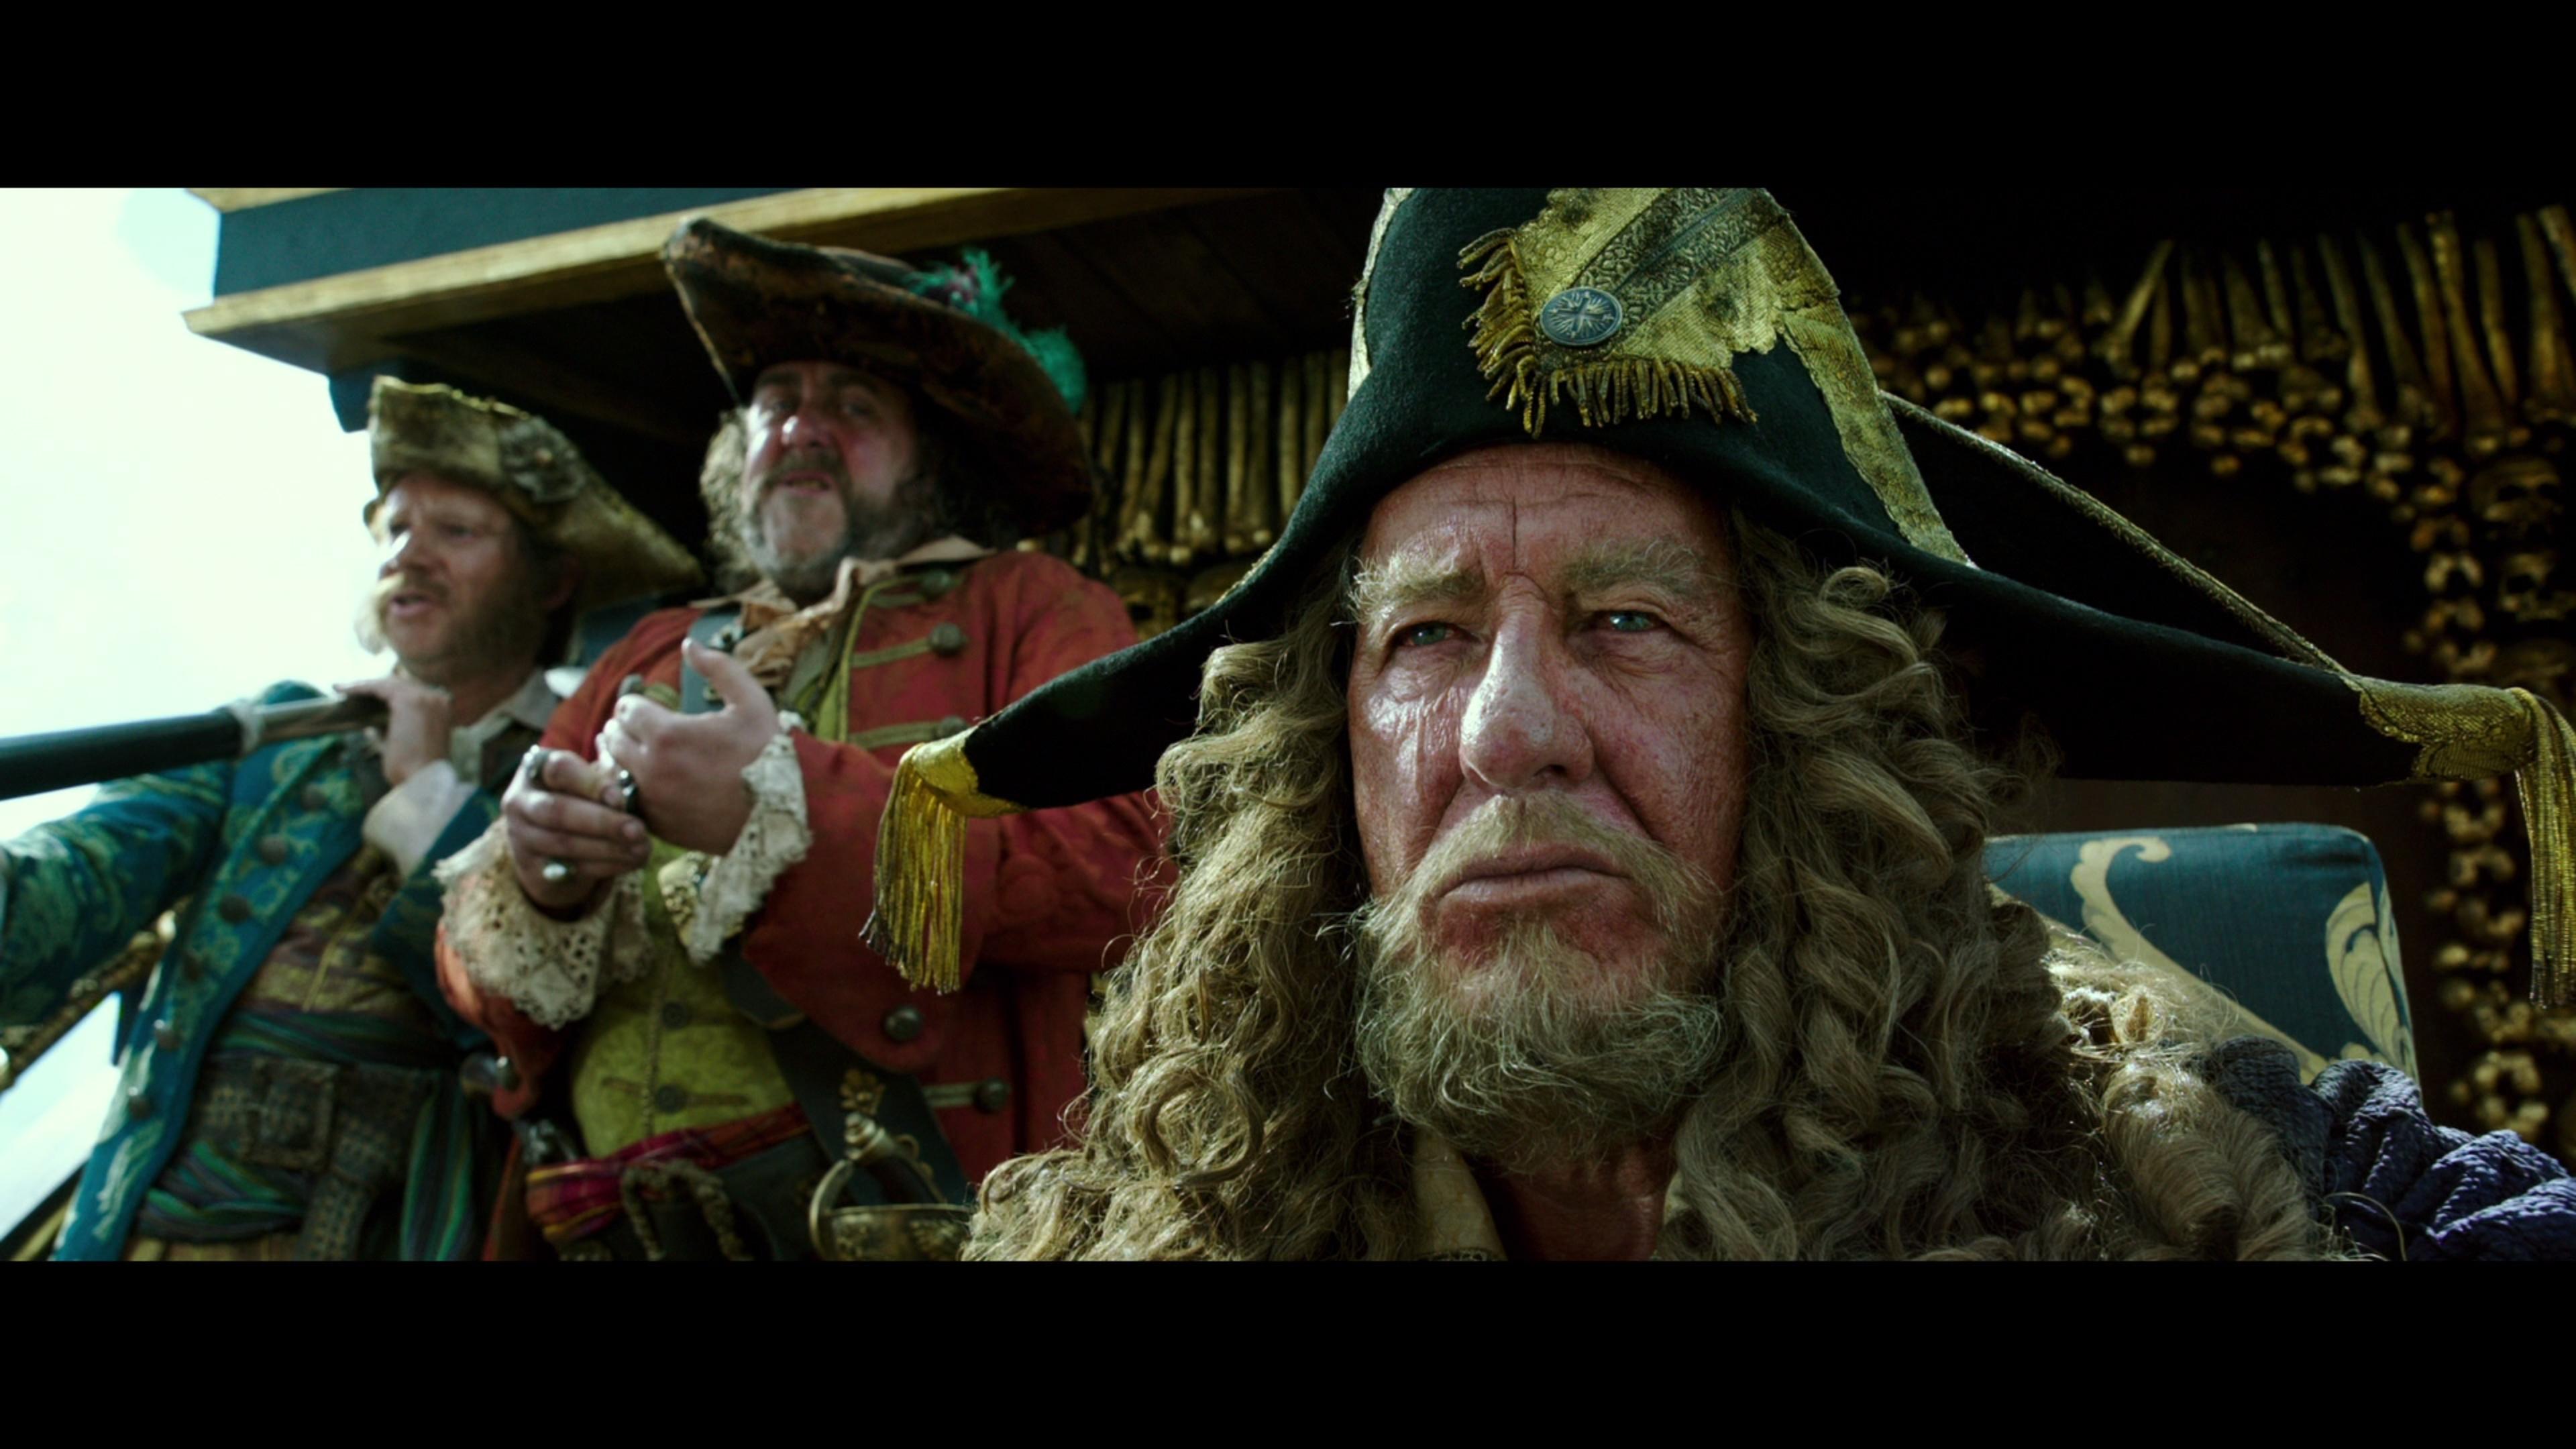 Caribbean Men: Pirates Of The Caribbean: Dead Men Tell No Tales Blu-ray